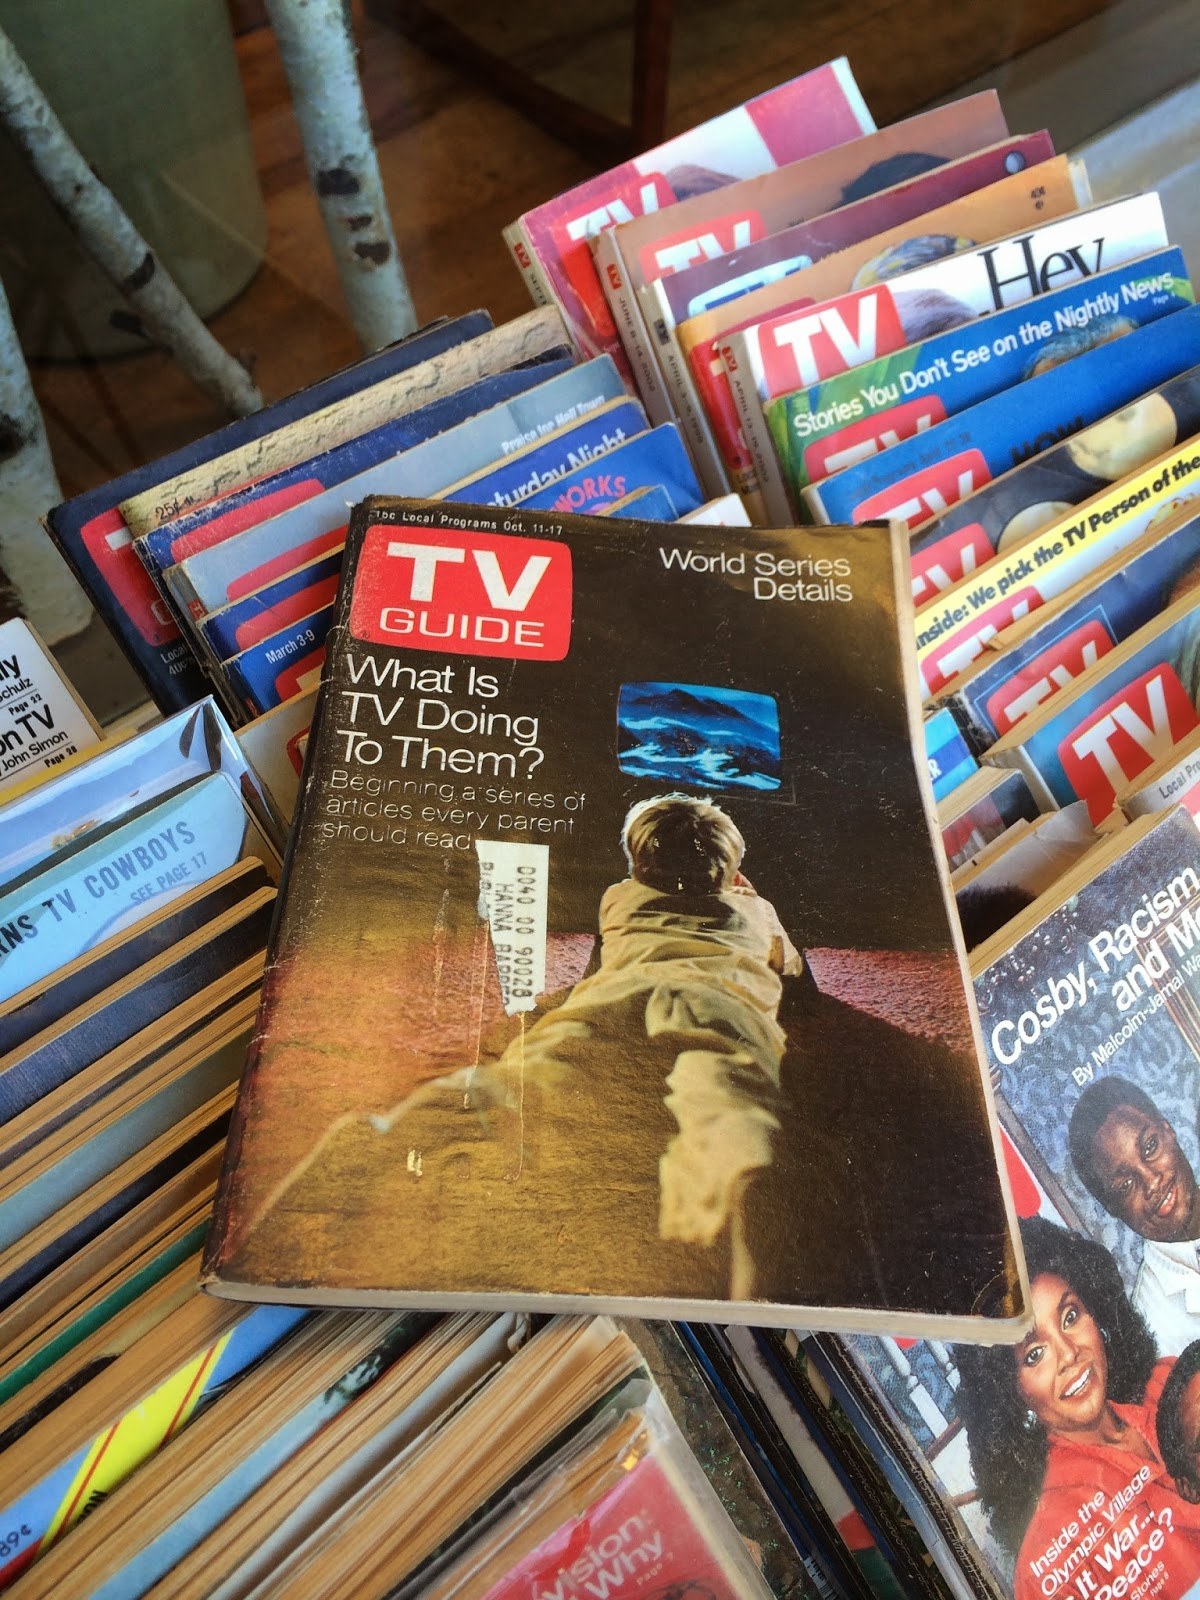 Vitage TV Guide